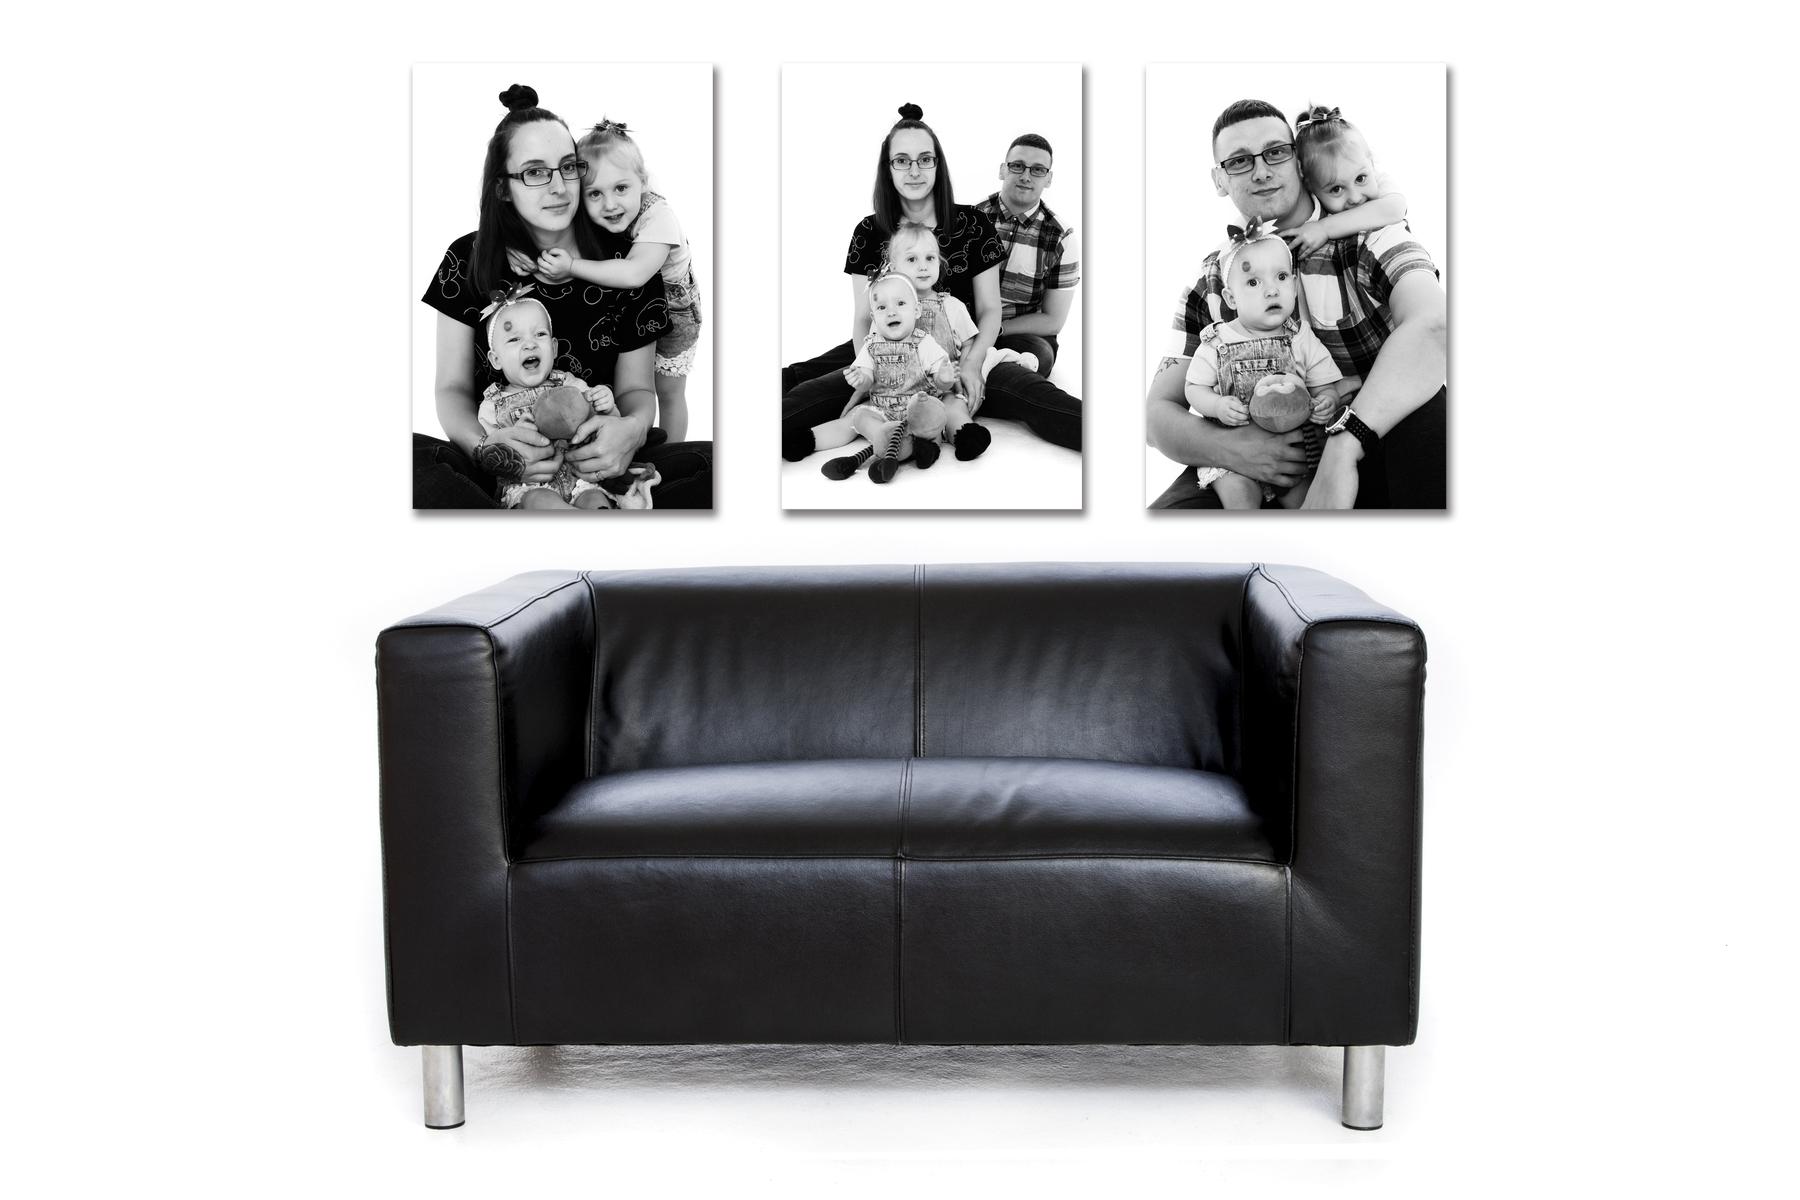 zig-zag-photography-leicester-family-portrait-photo-shoot